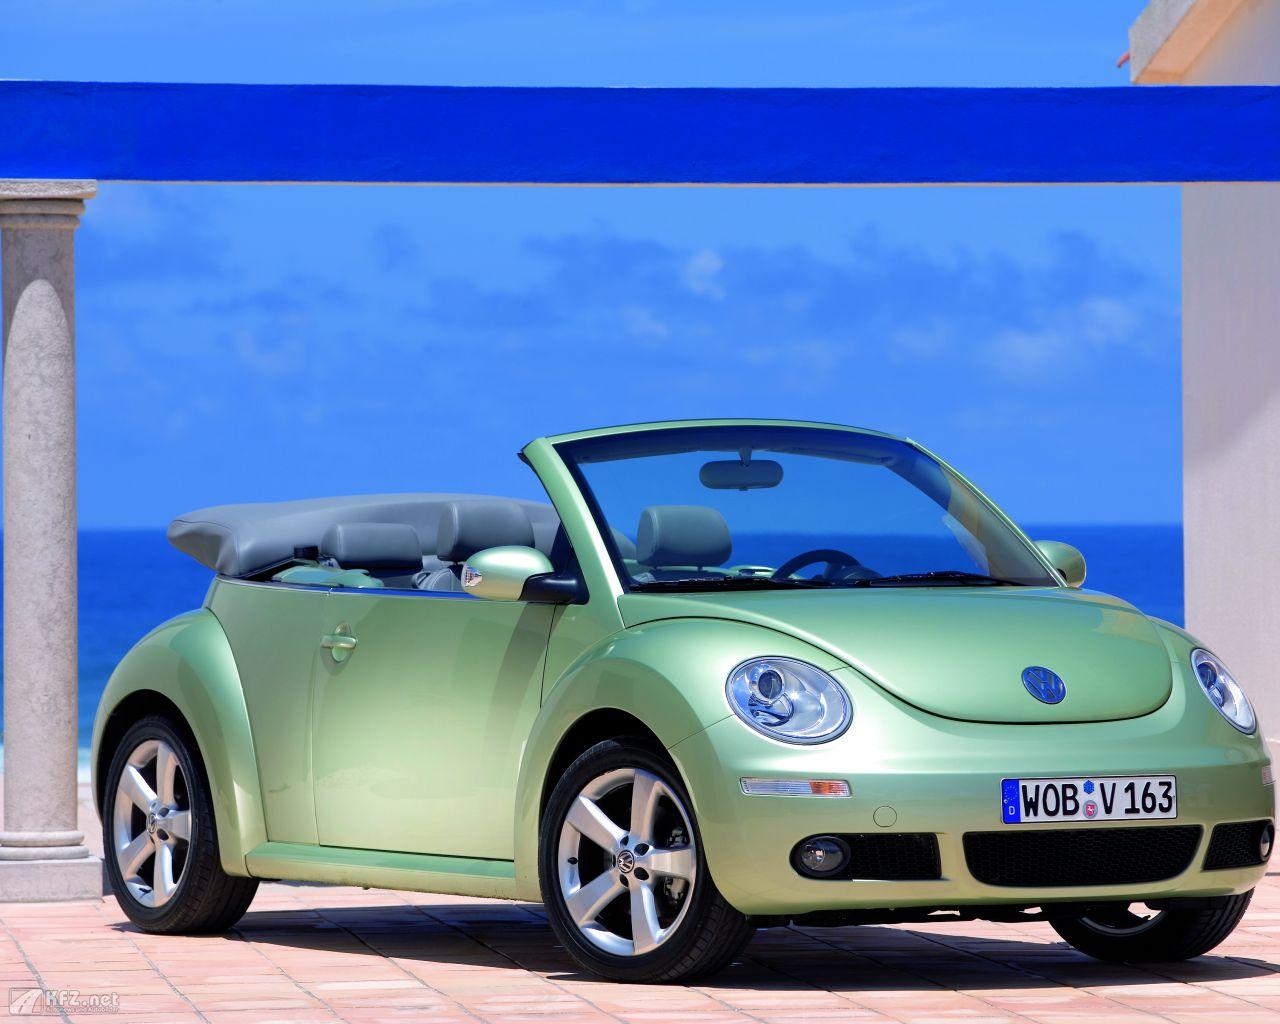 vw-beetle-1280x1024-17